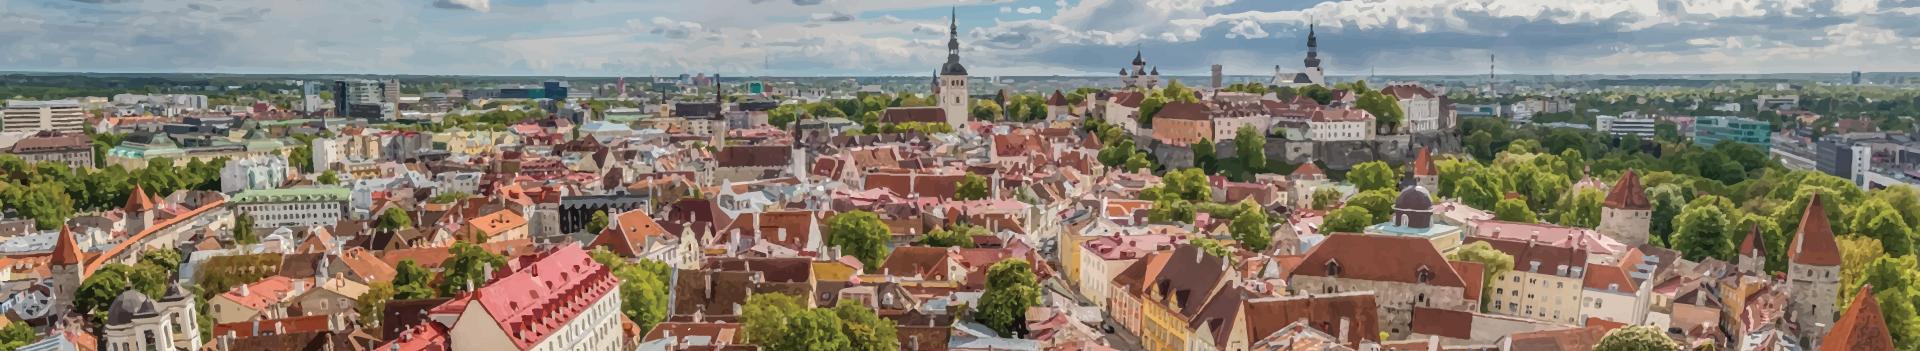 Kitesurfing in Estonia